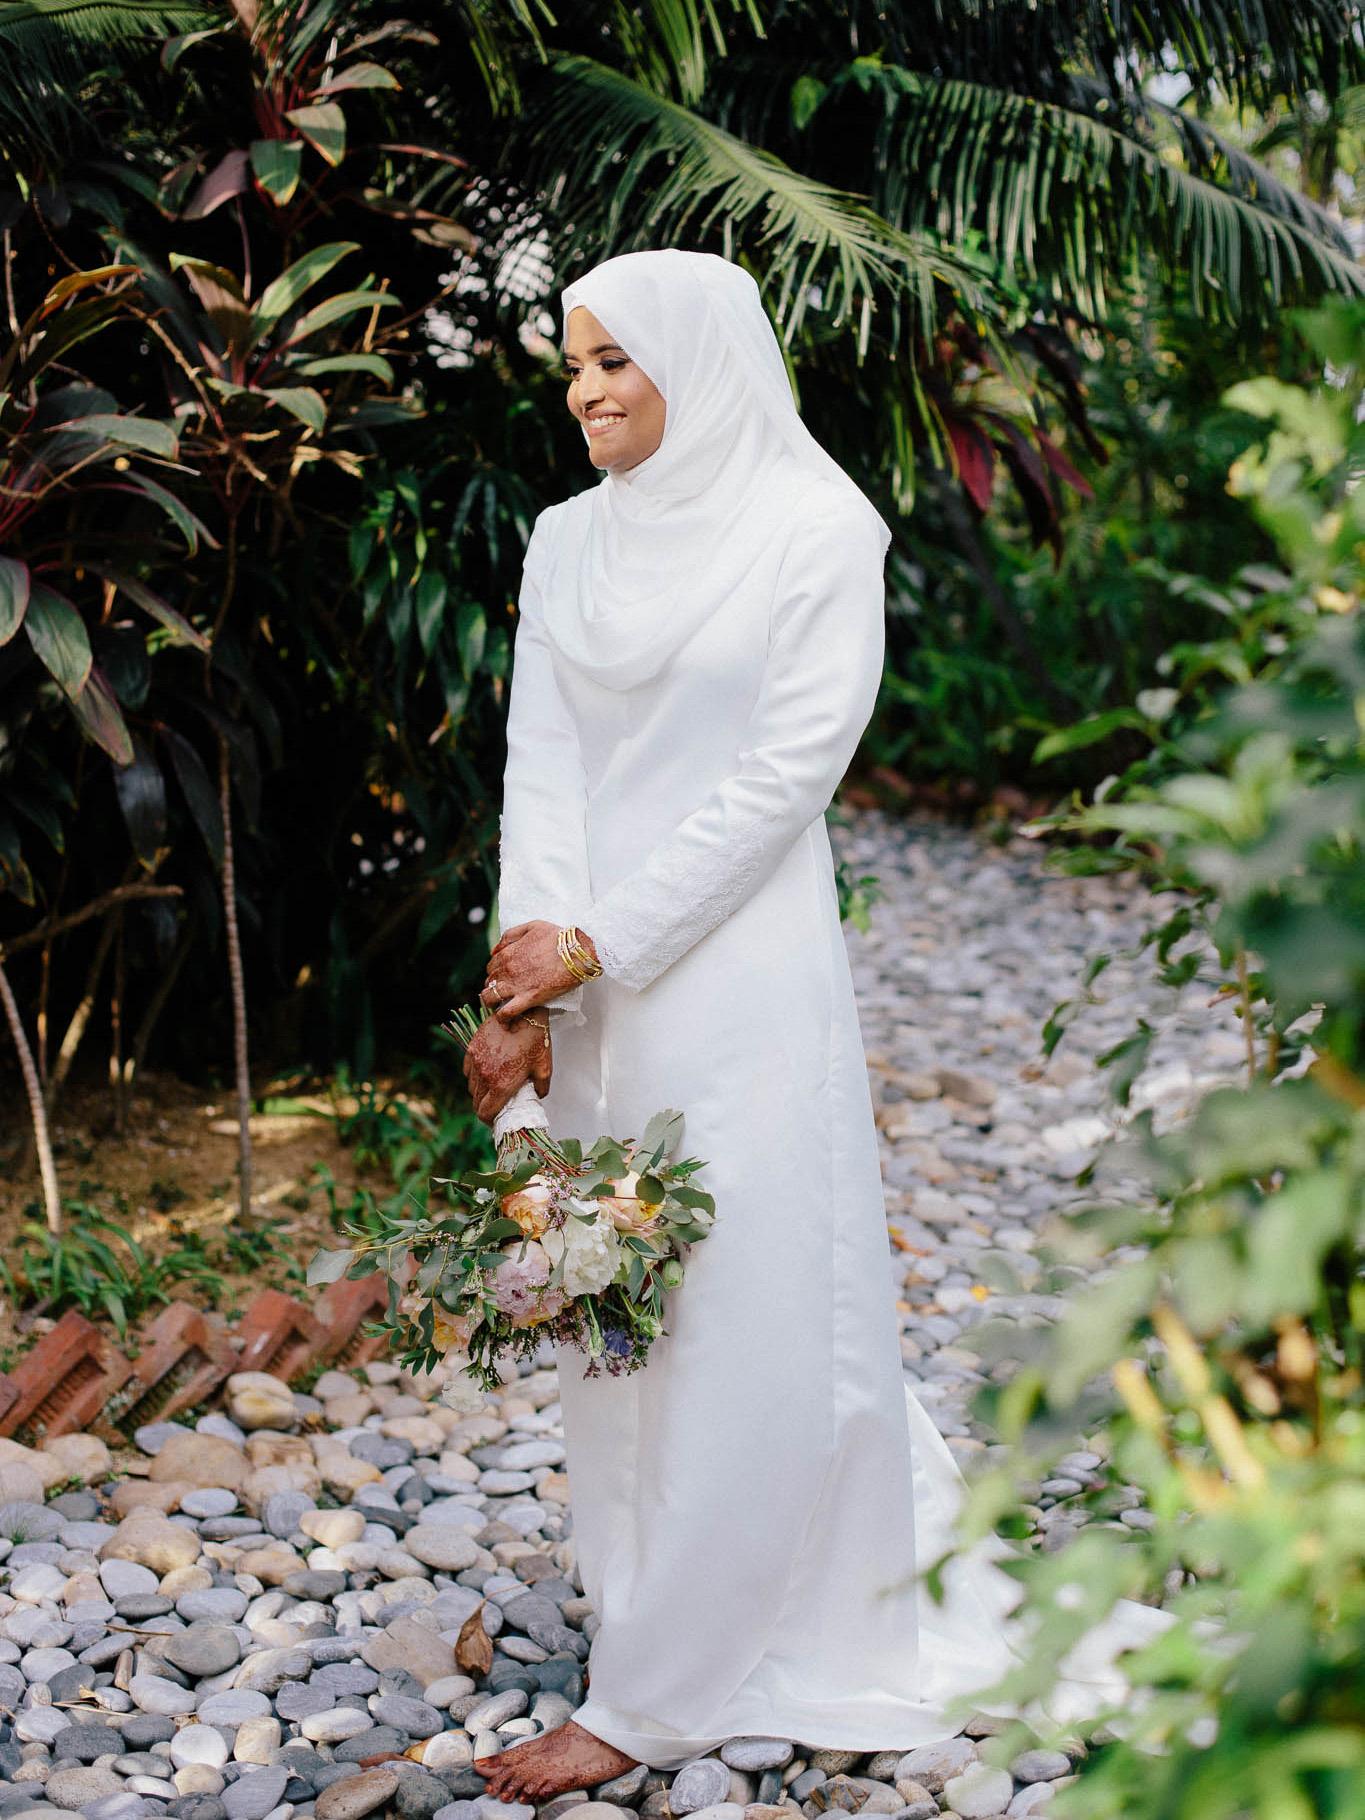 singapore-wedding-photographer-malay-indian-pre-wedding-travel-wmt-2015-26.jpg